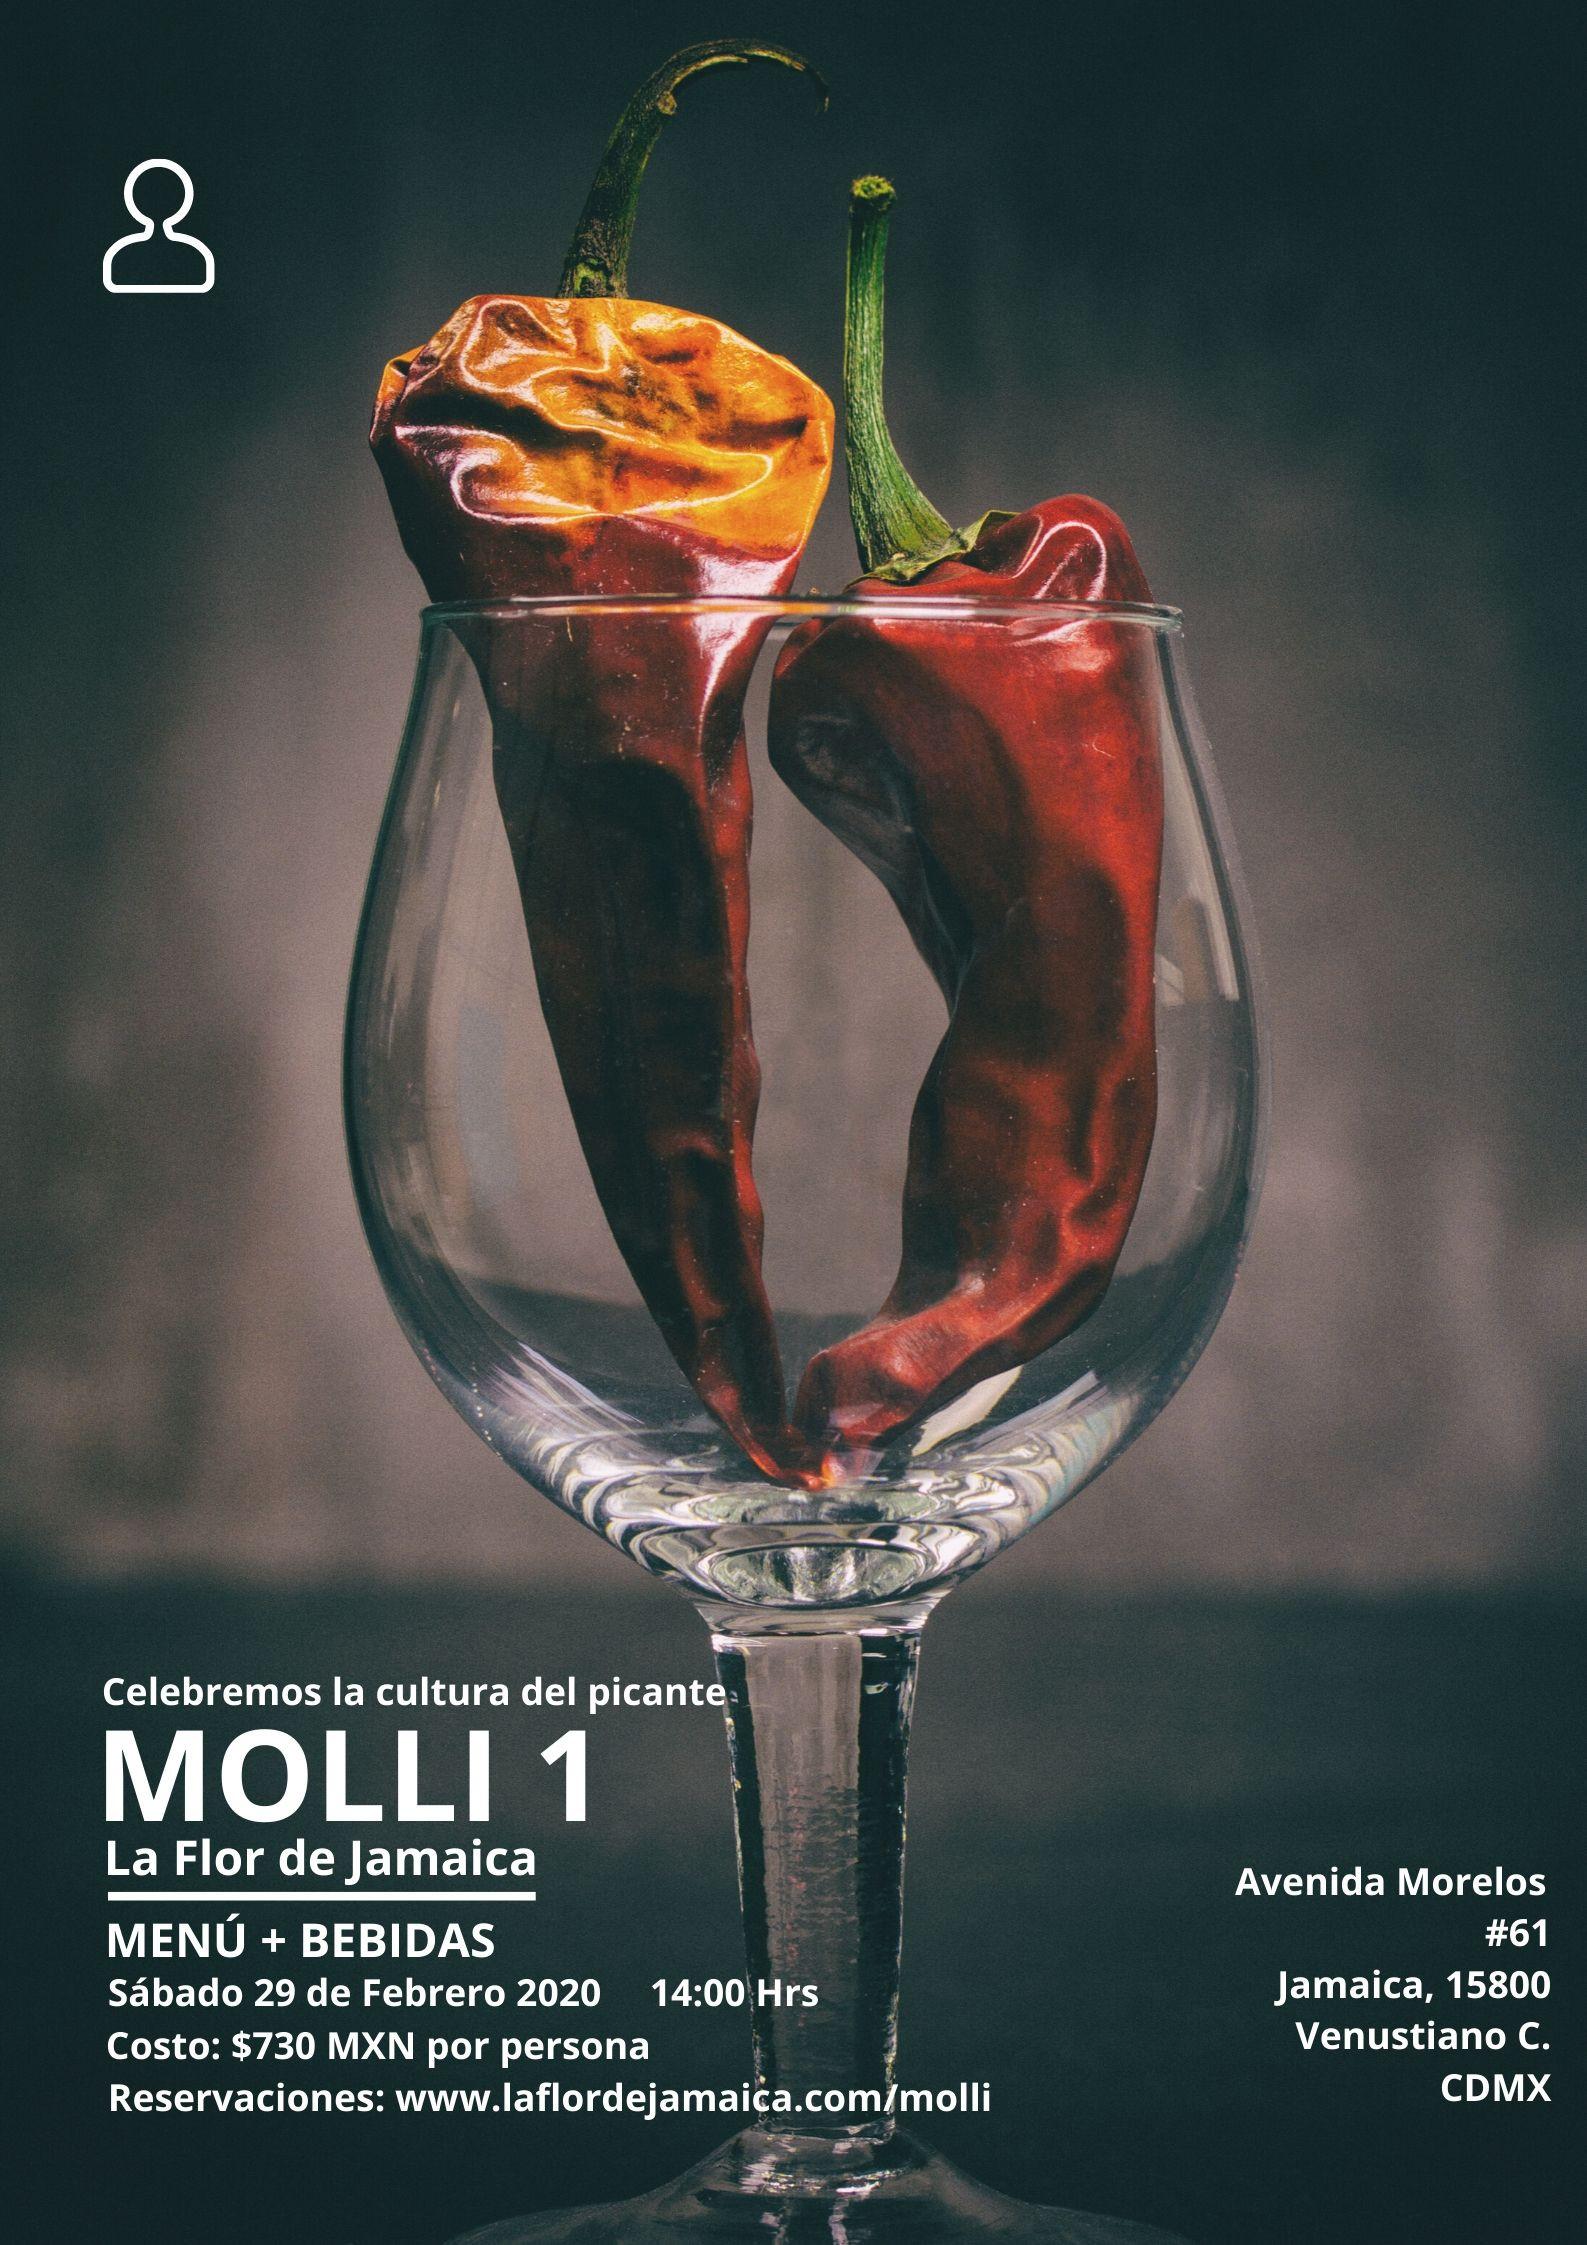 Molli 1